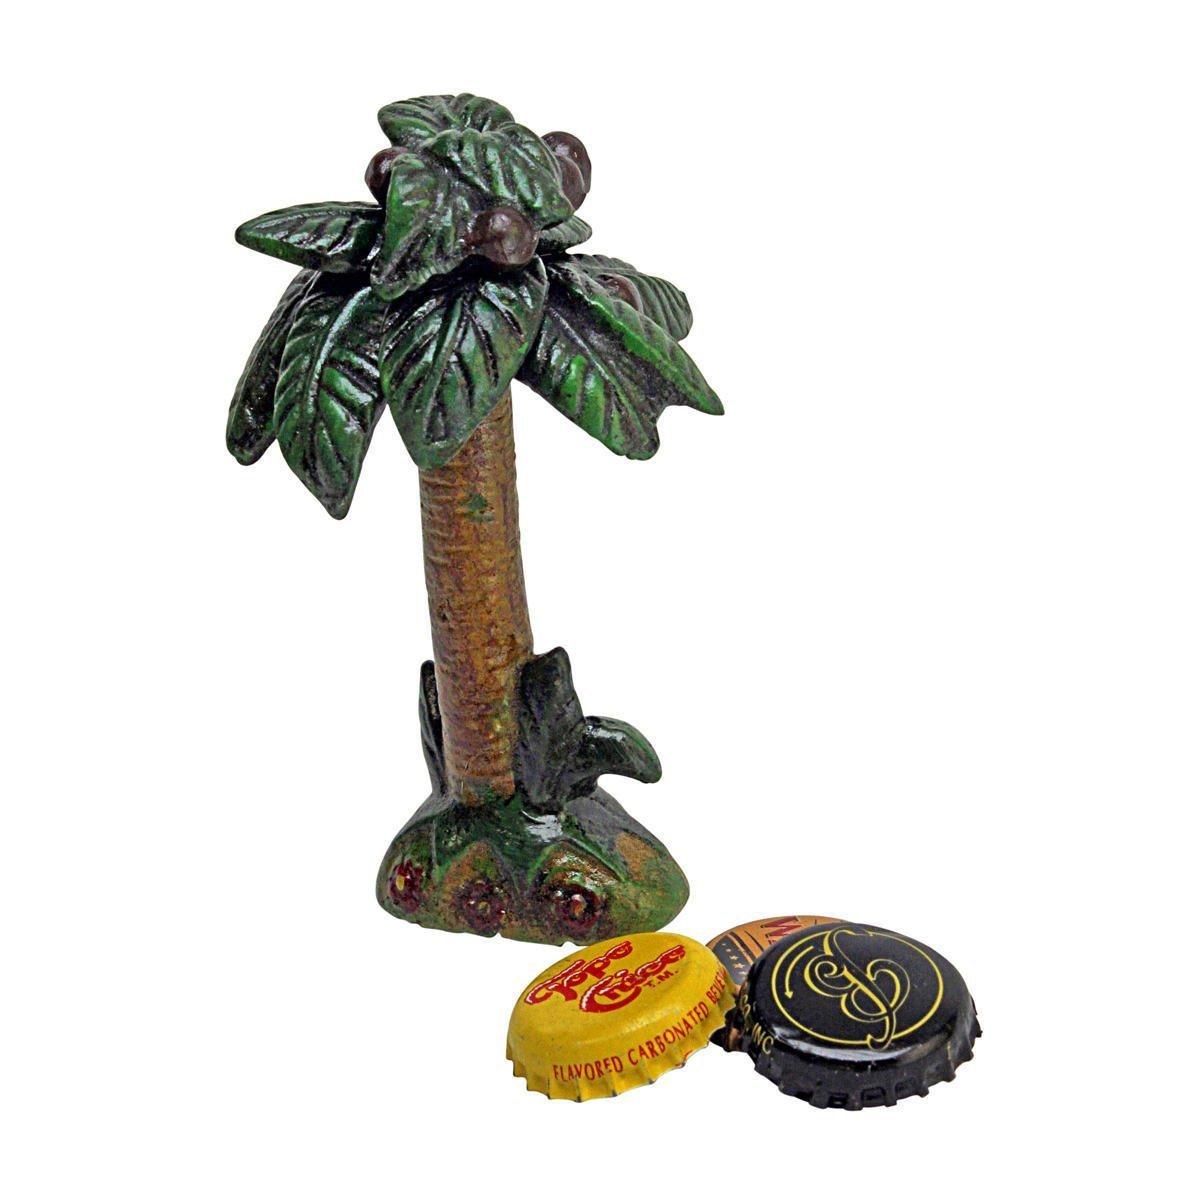 Tropical Coconut Tree Cast Iron Bottle Opener